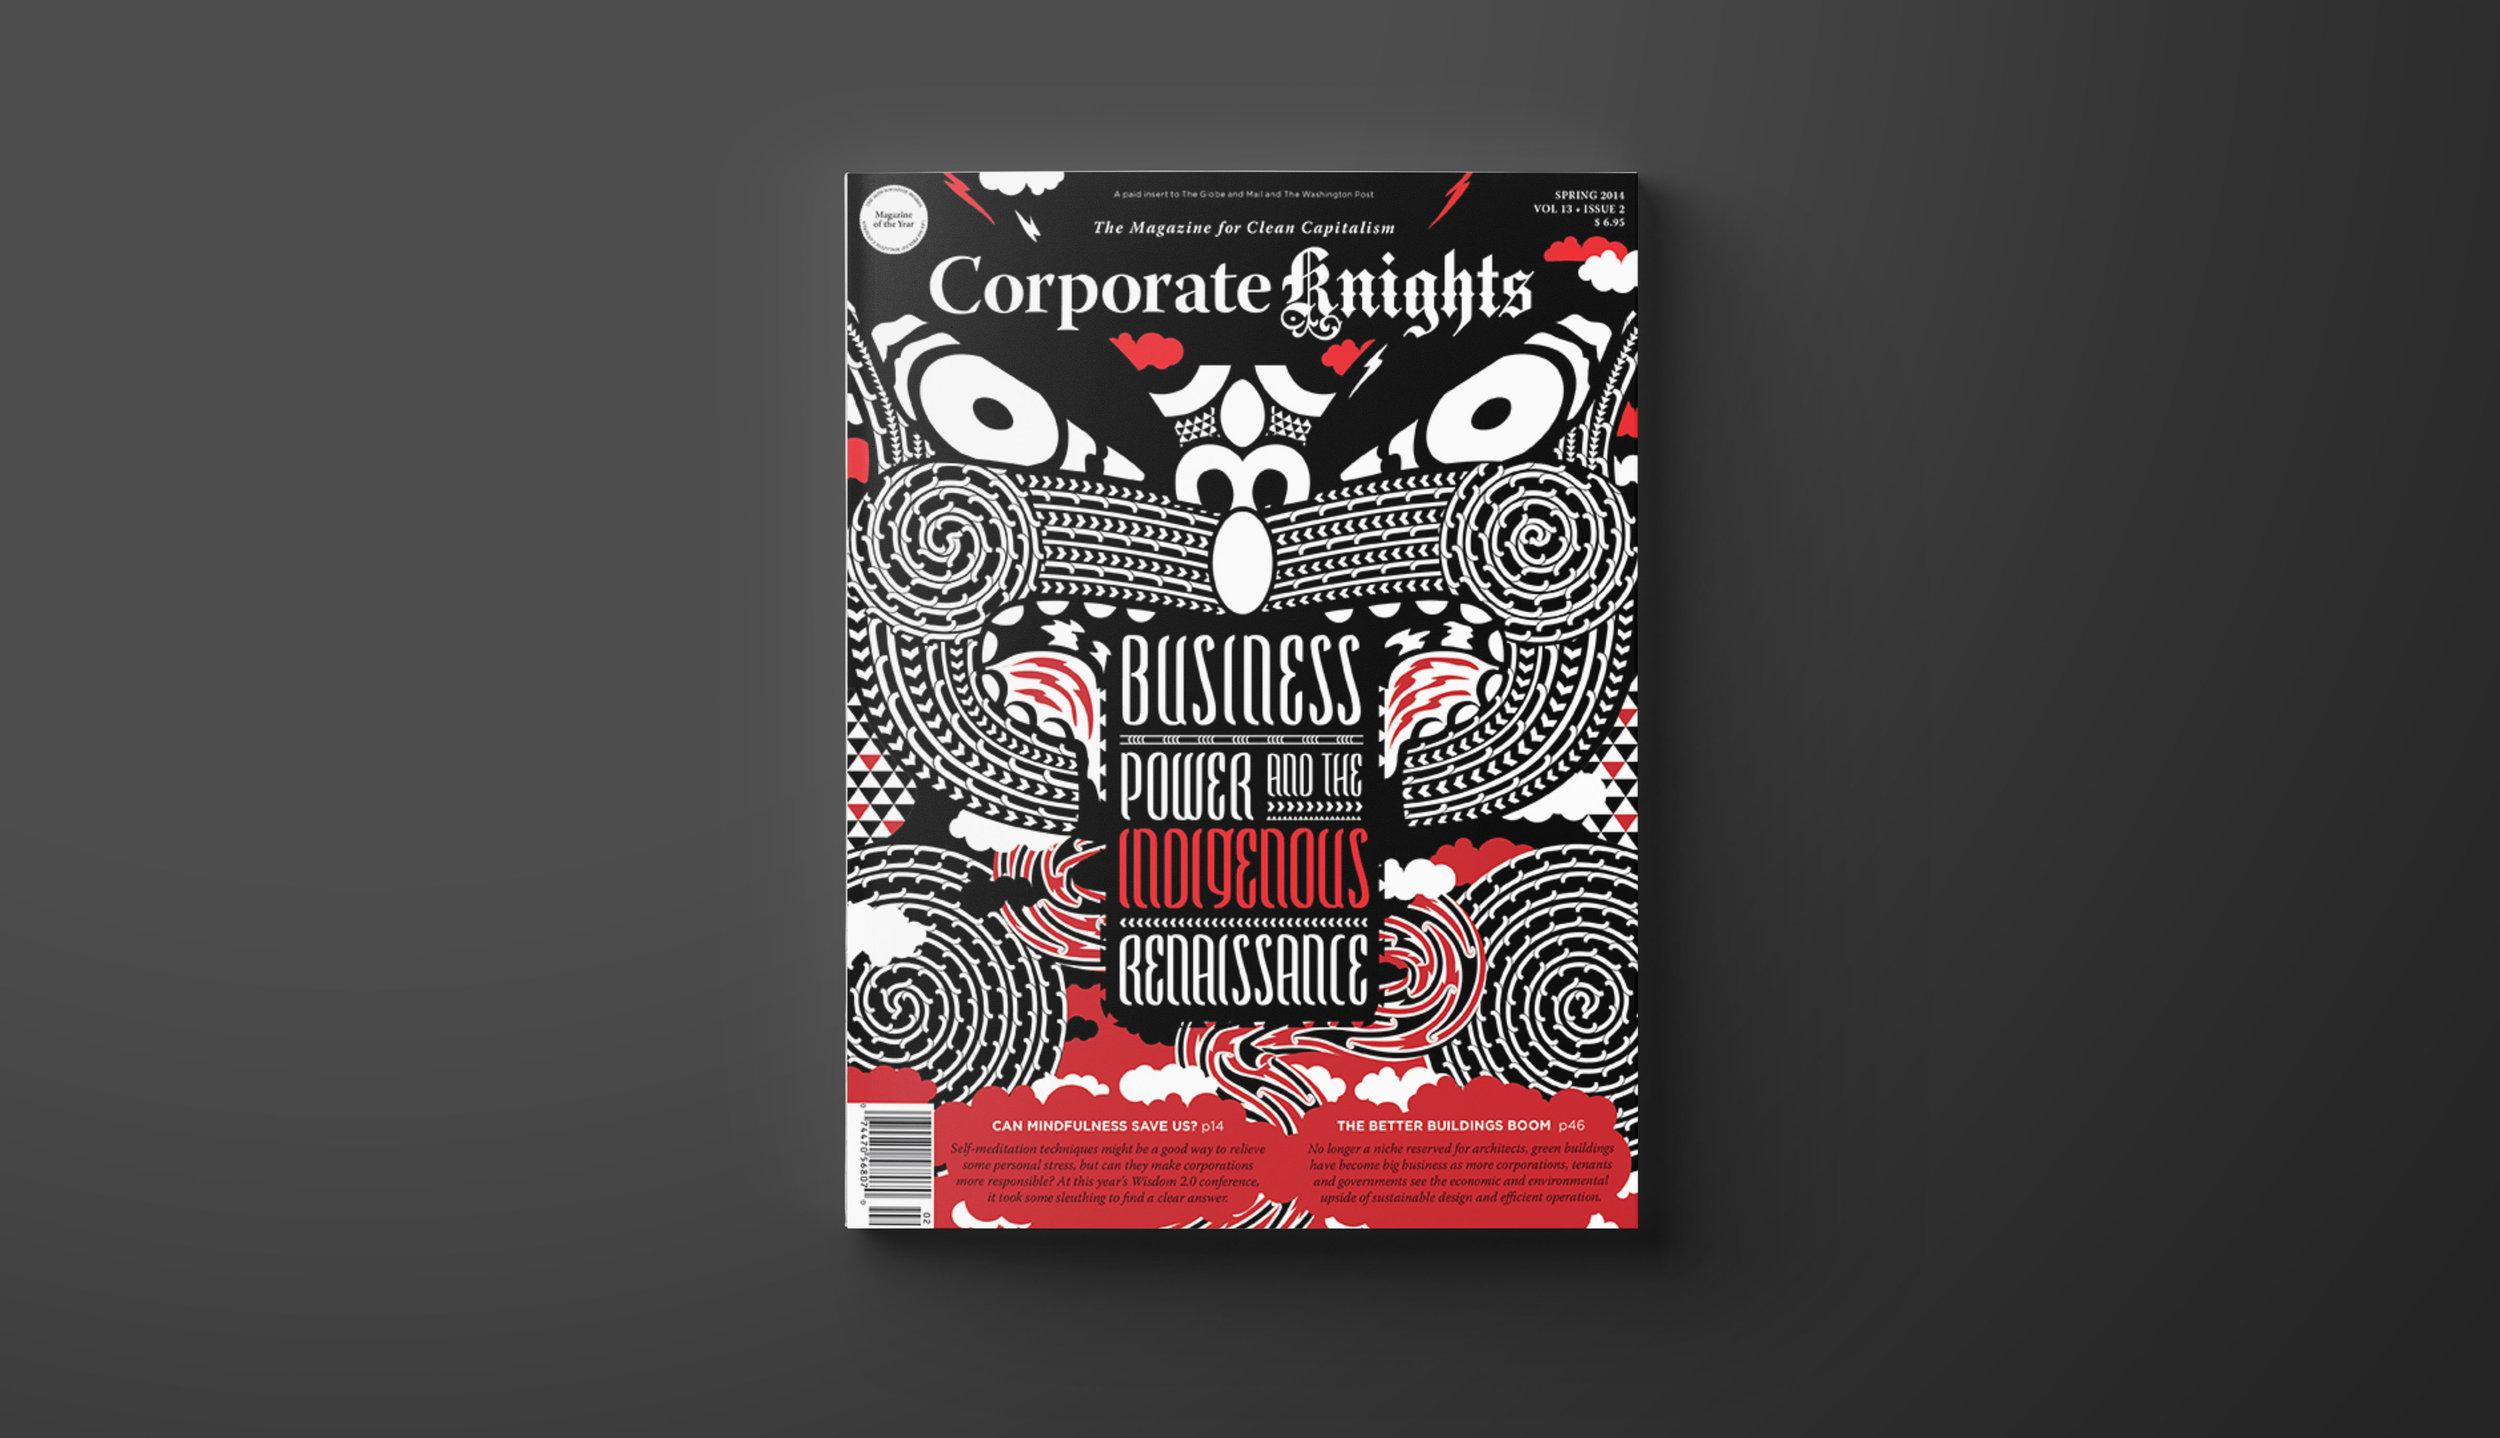 Magazine-USLetter-A4-Mockup-TemplateCK_Aboriginal.jpg